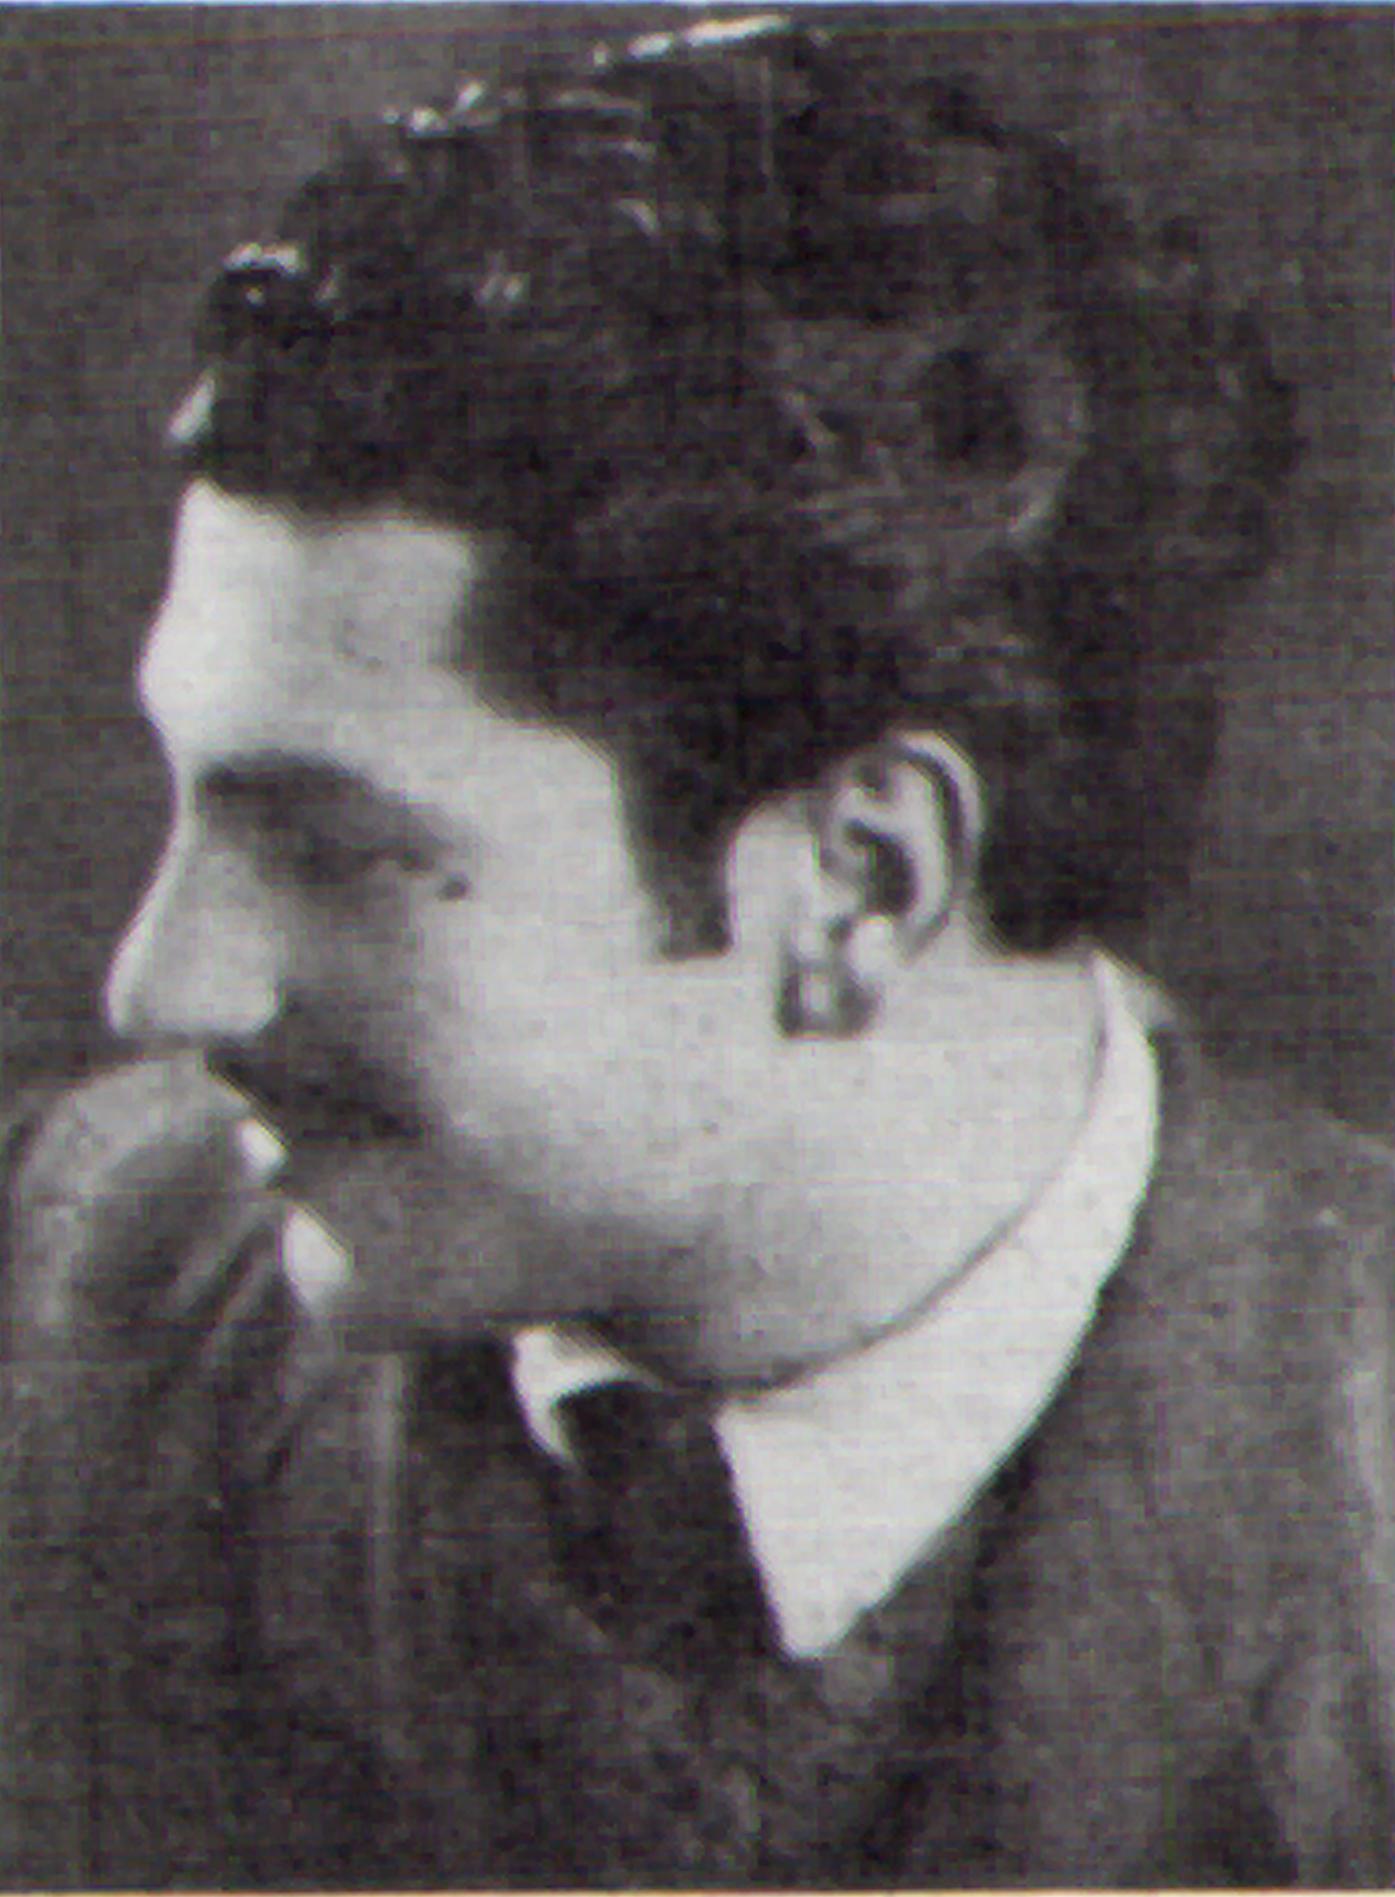 Butticè Leonardo 1921